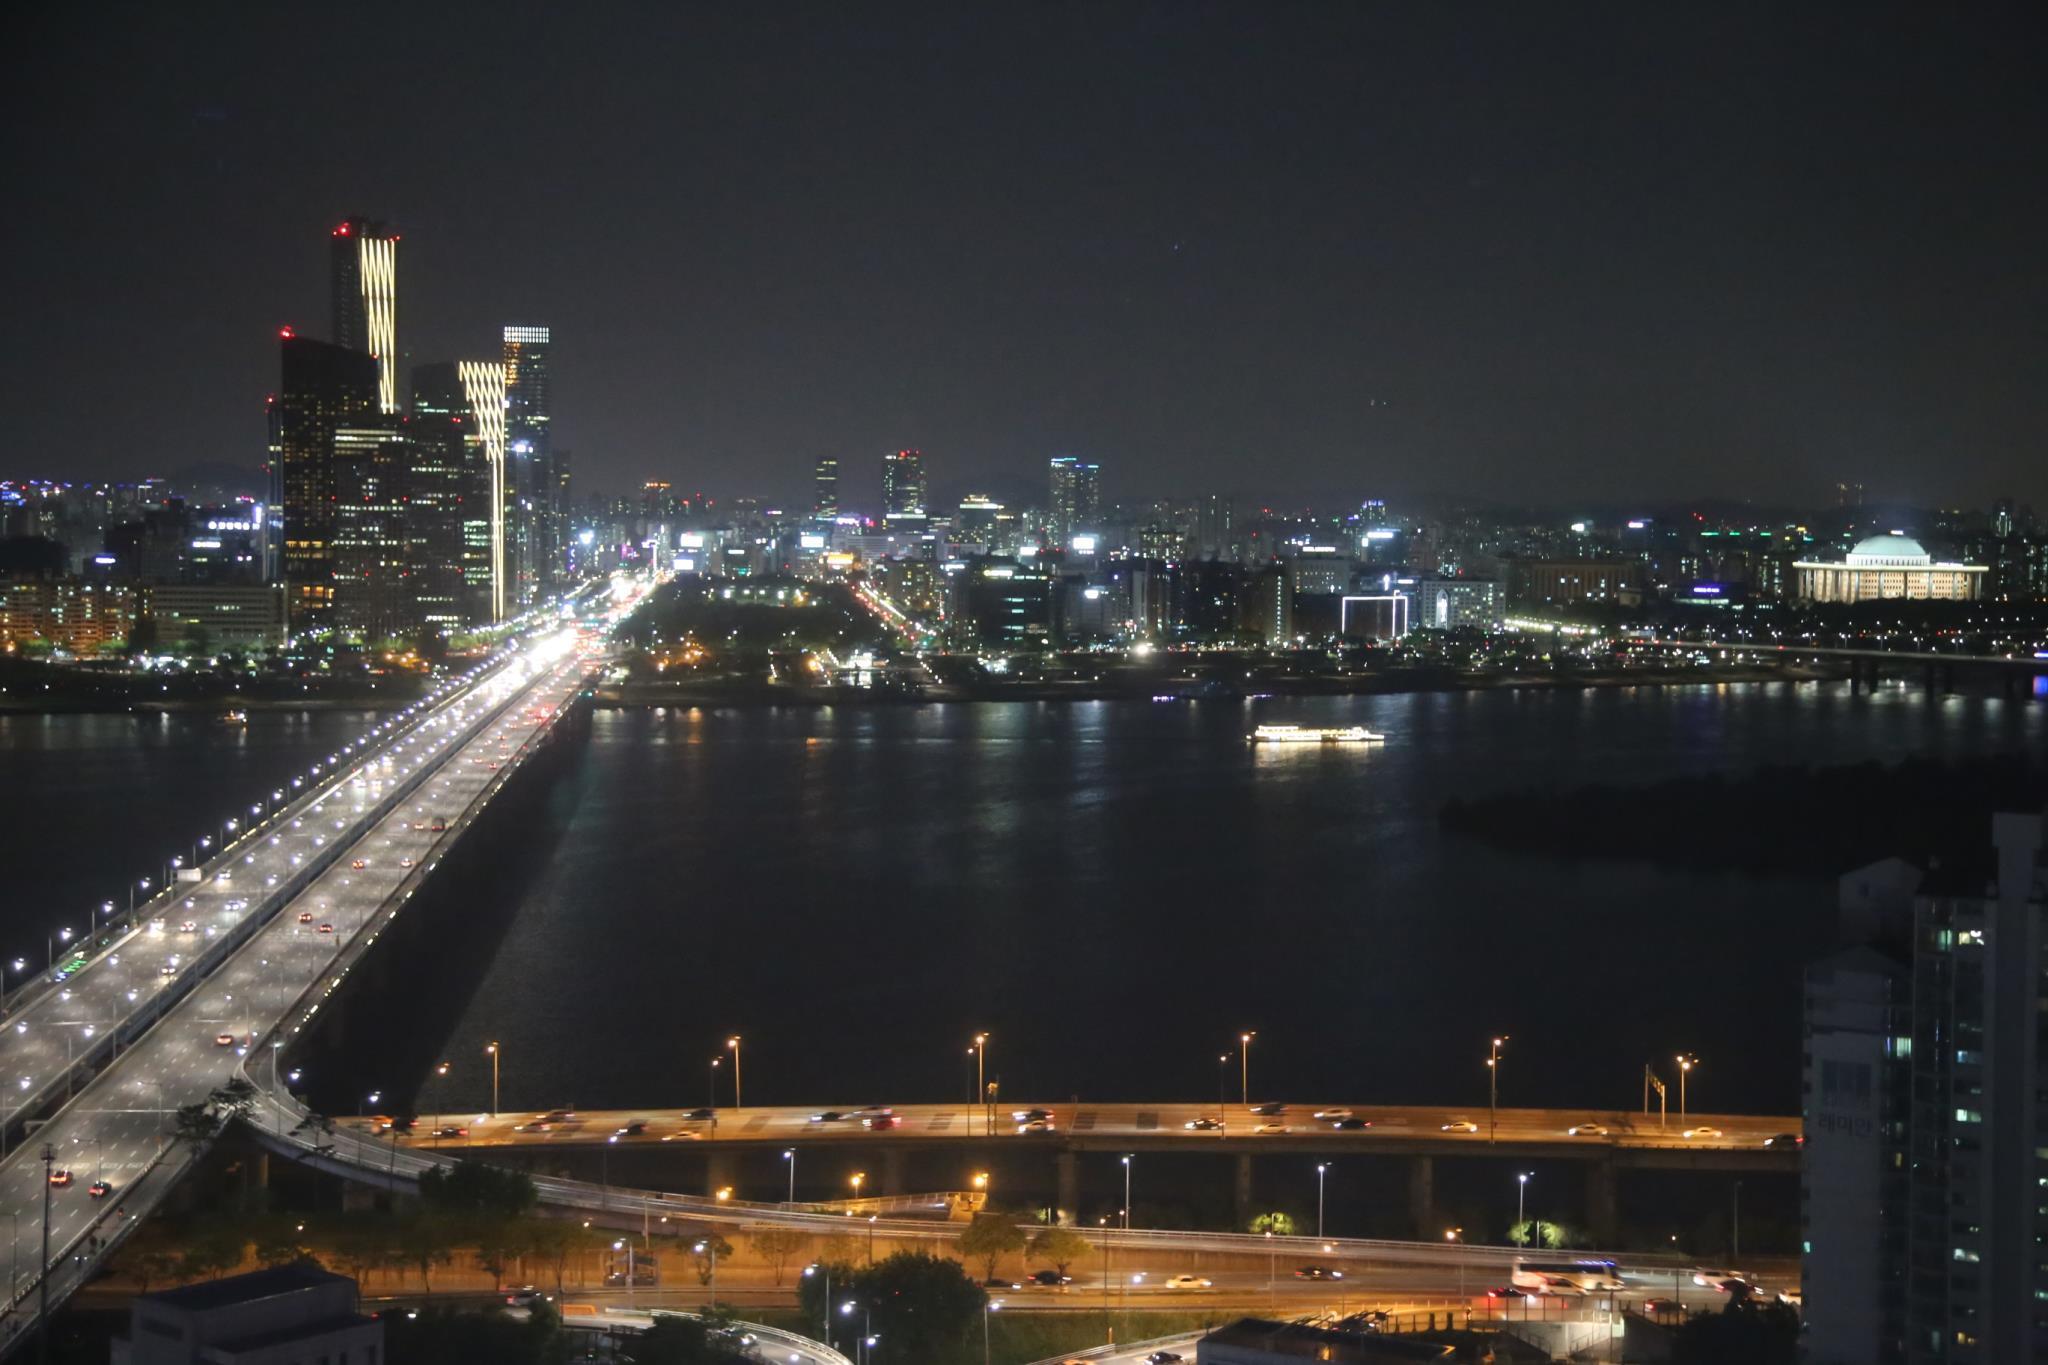 Micasa@Seoul